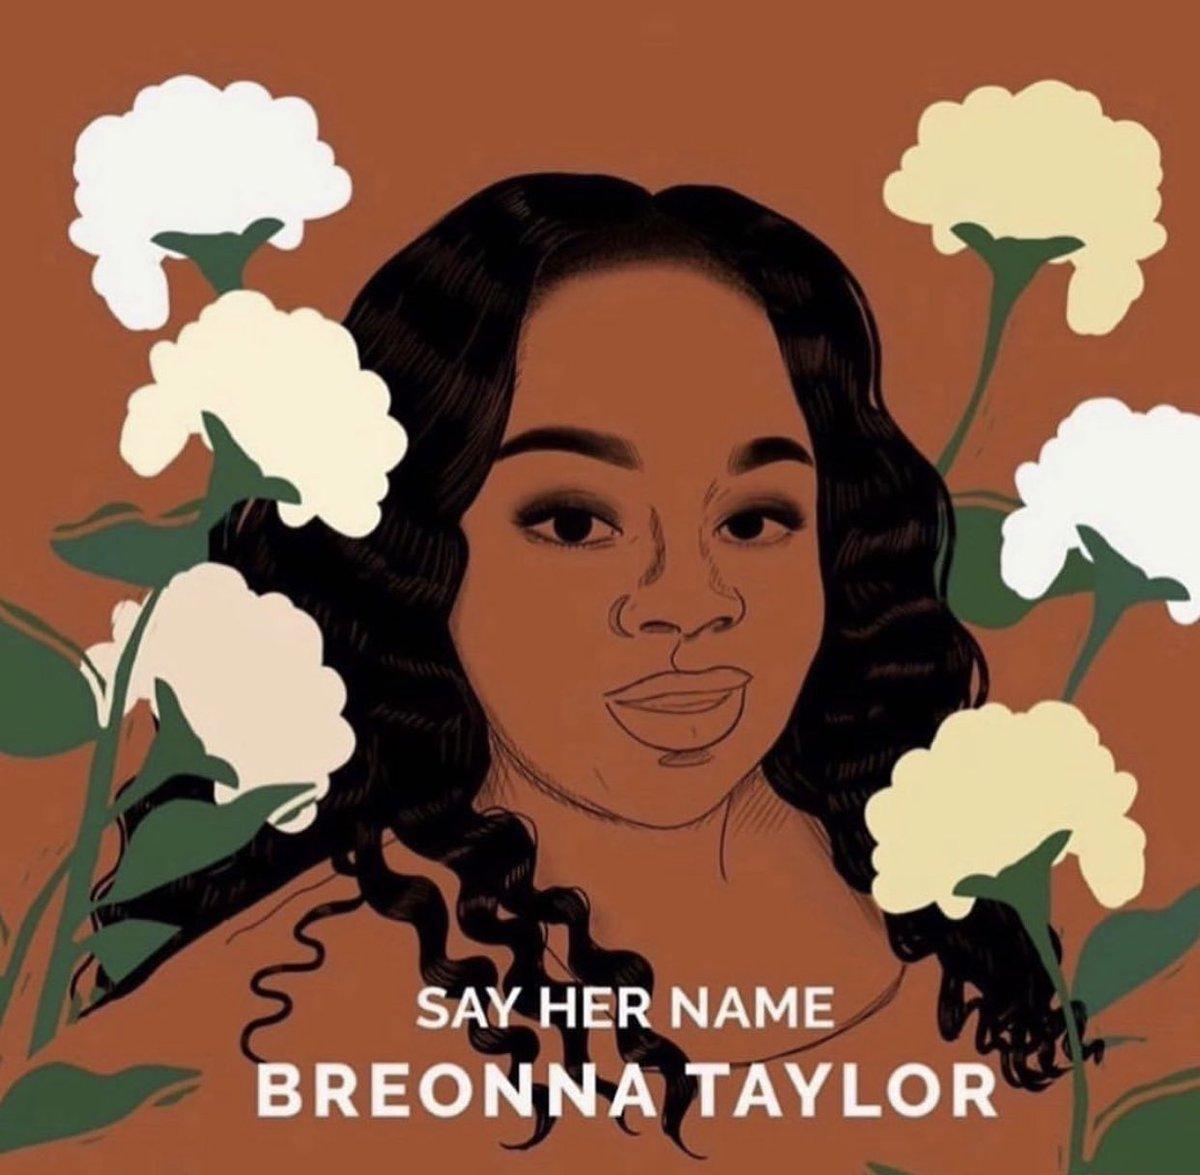 Say Her Name #JusticeforBreonnaTaylor